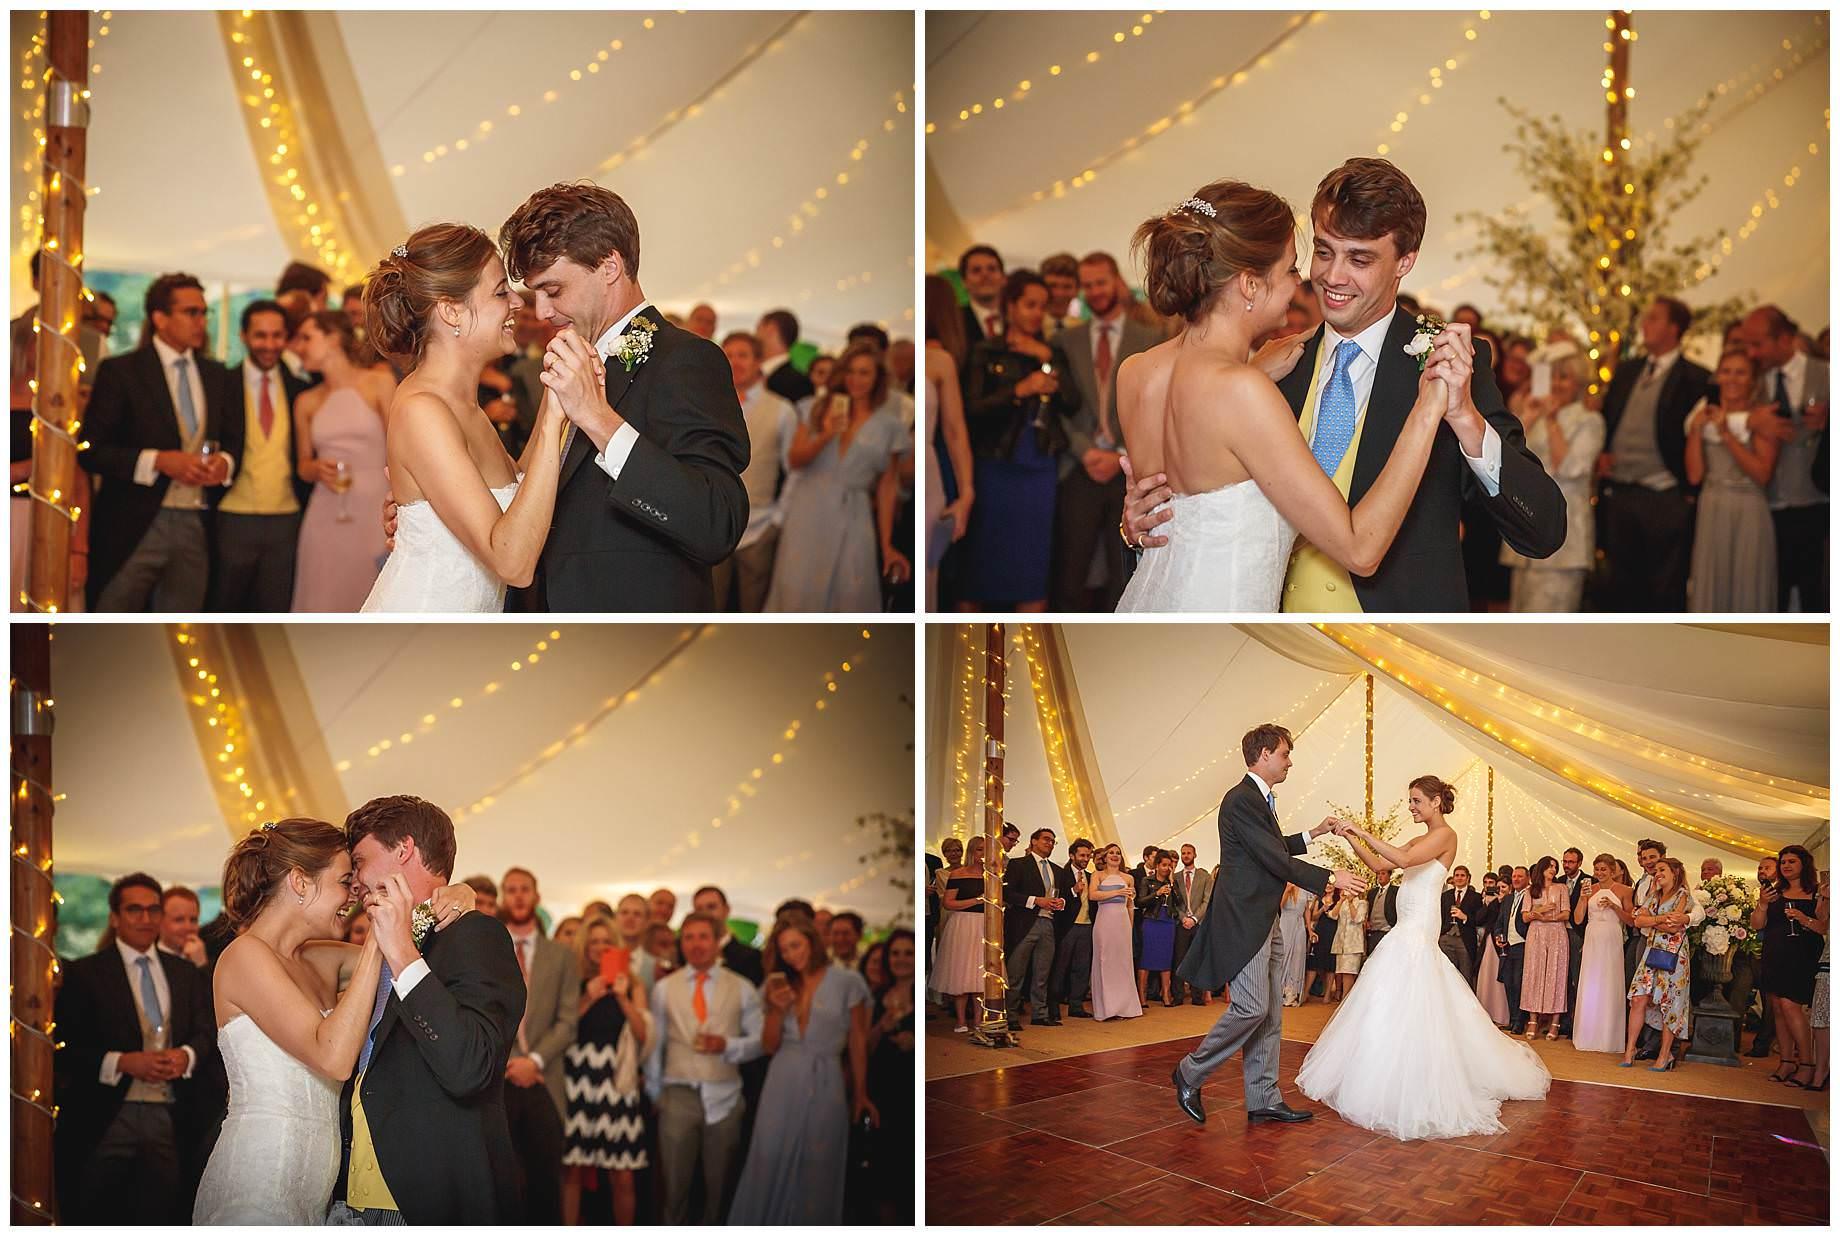 Goodnestone Park Wedding dancing